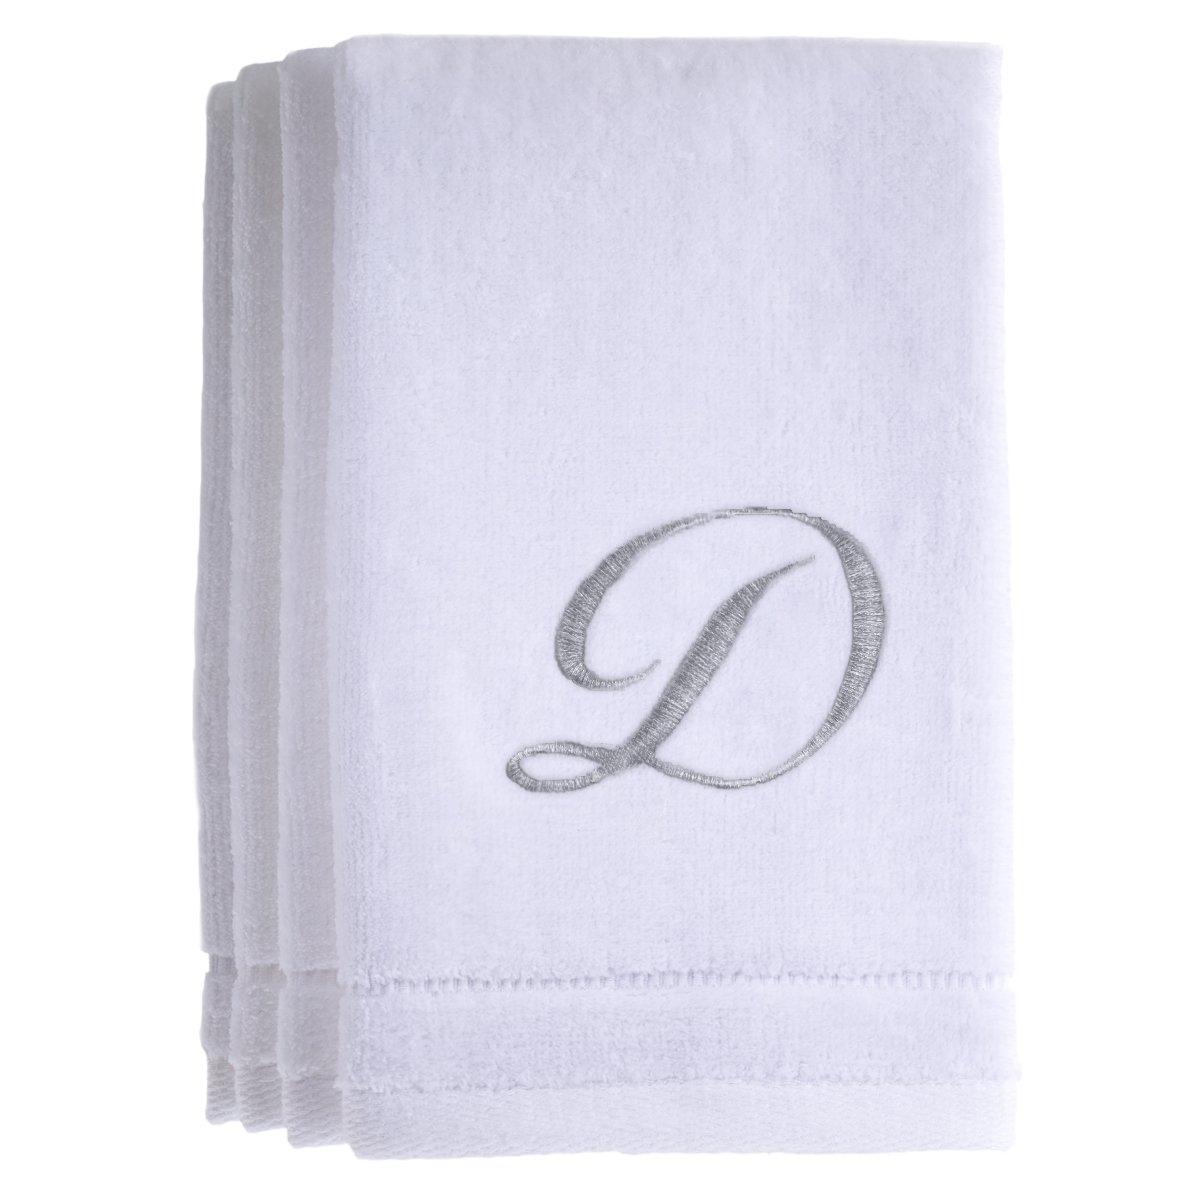 Nautical Bath Towels: Amazon.com